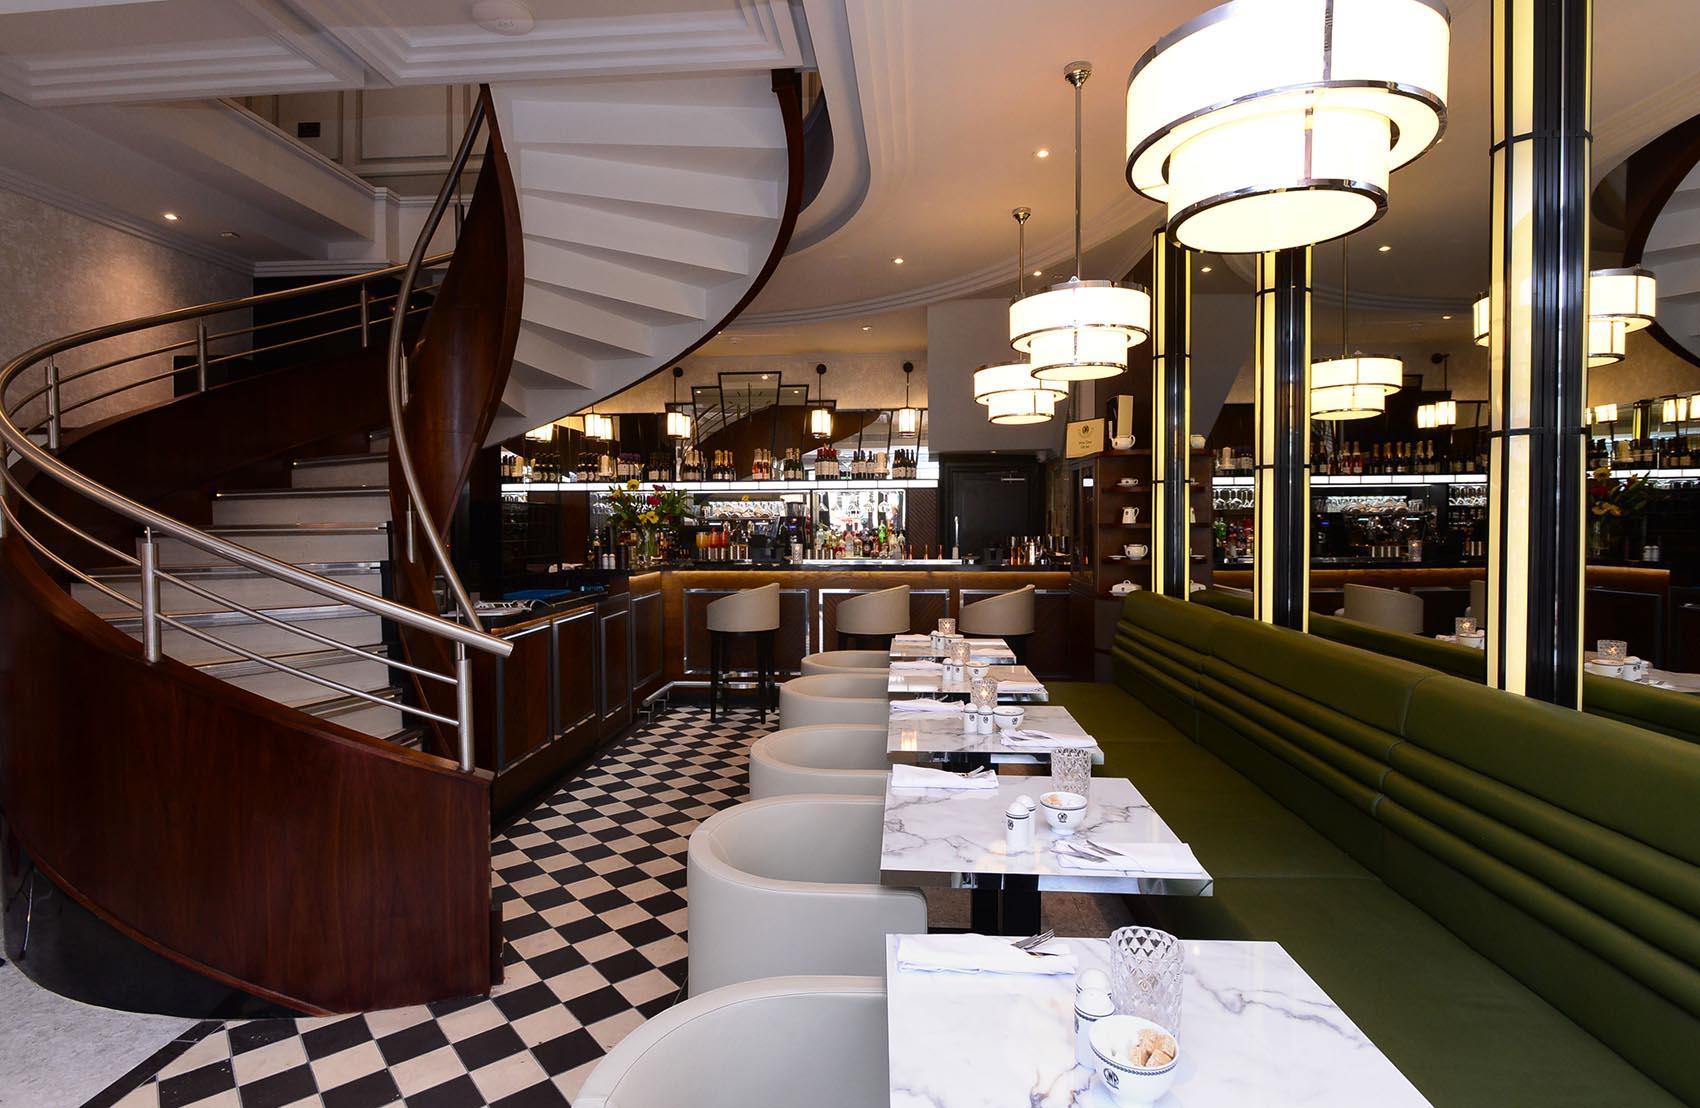 Centenary-Lounge-afternoon-tea